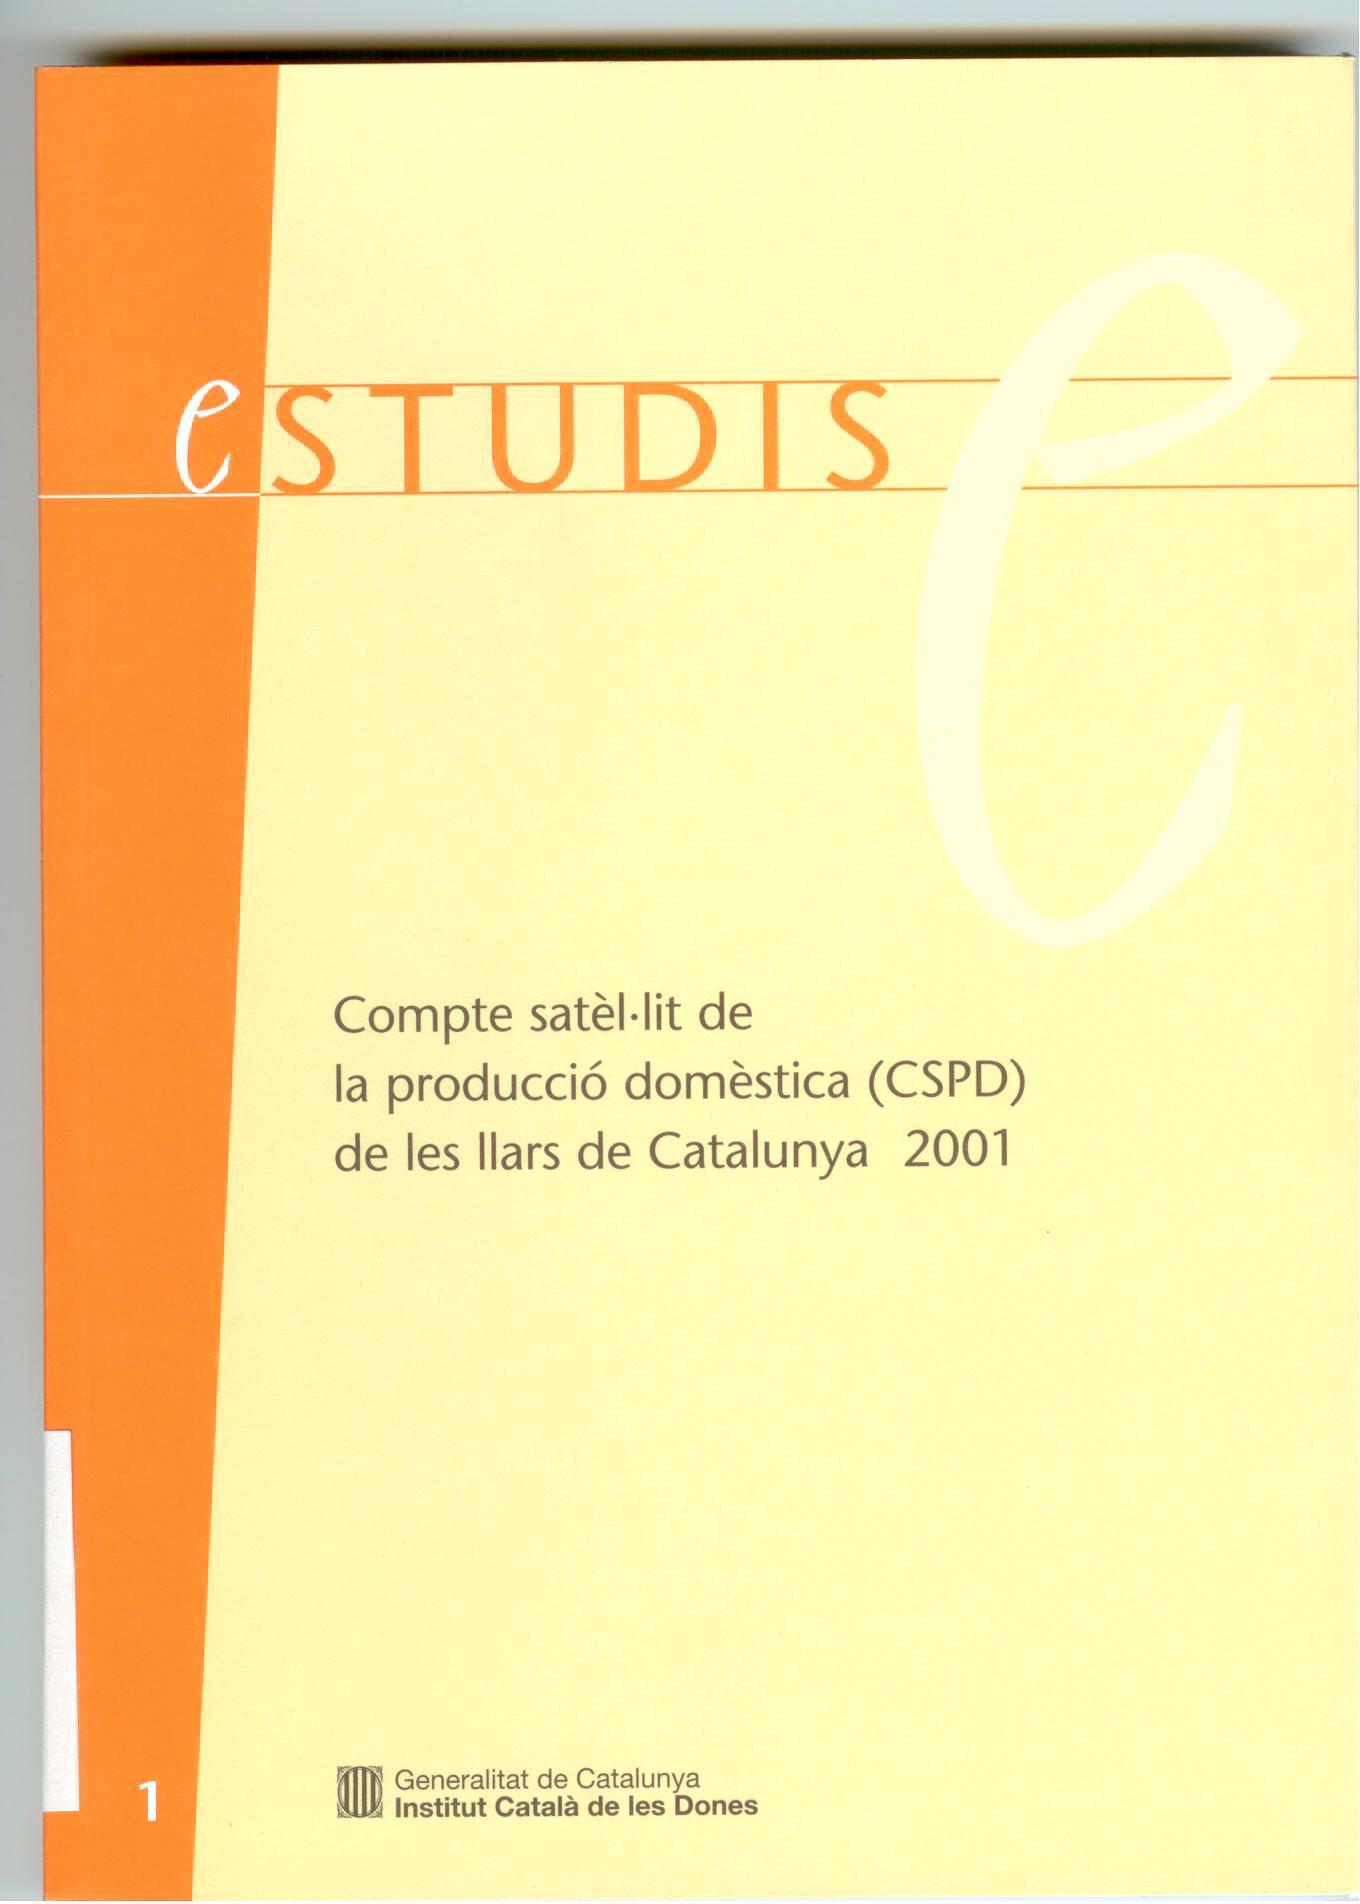 estudis.jpg